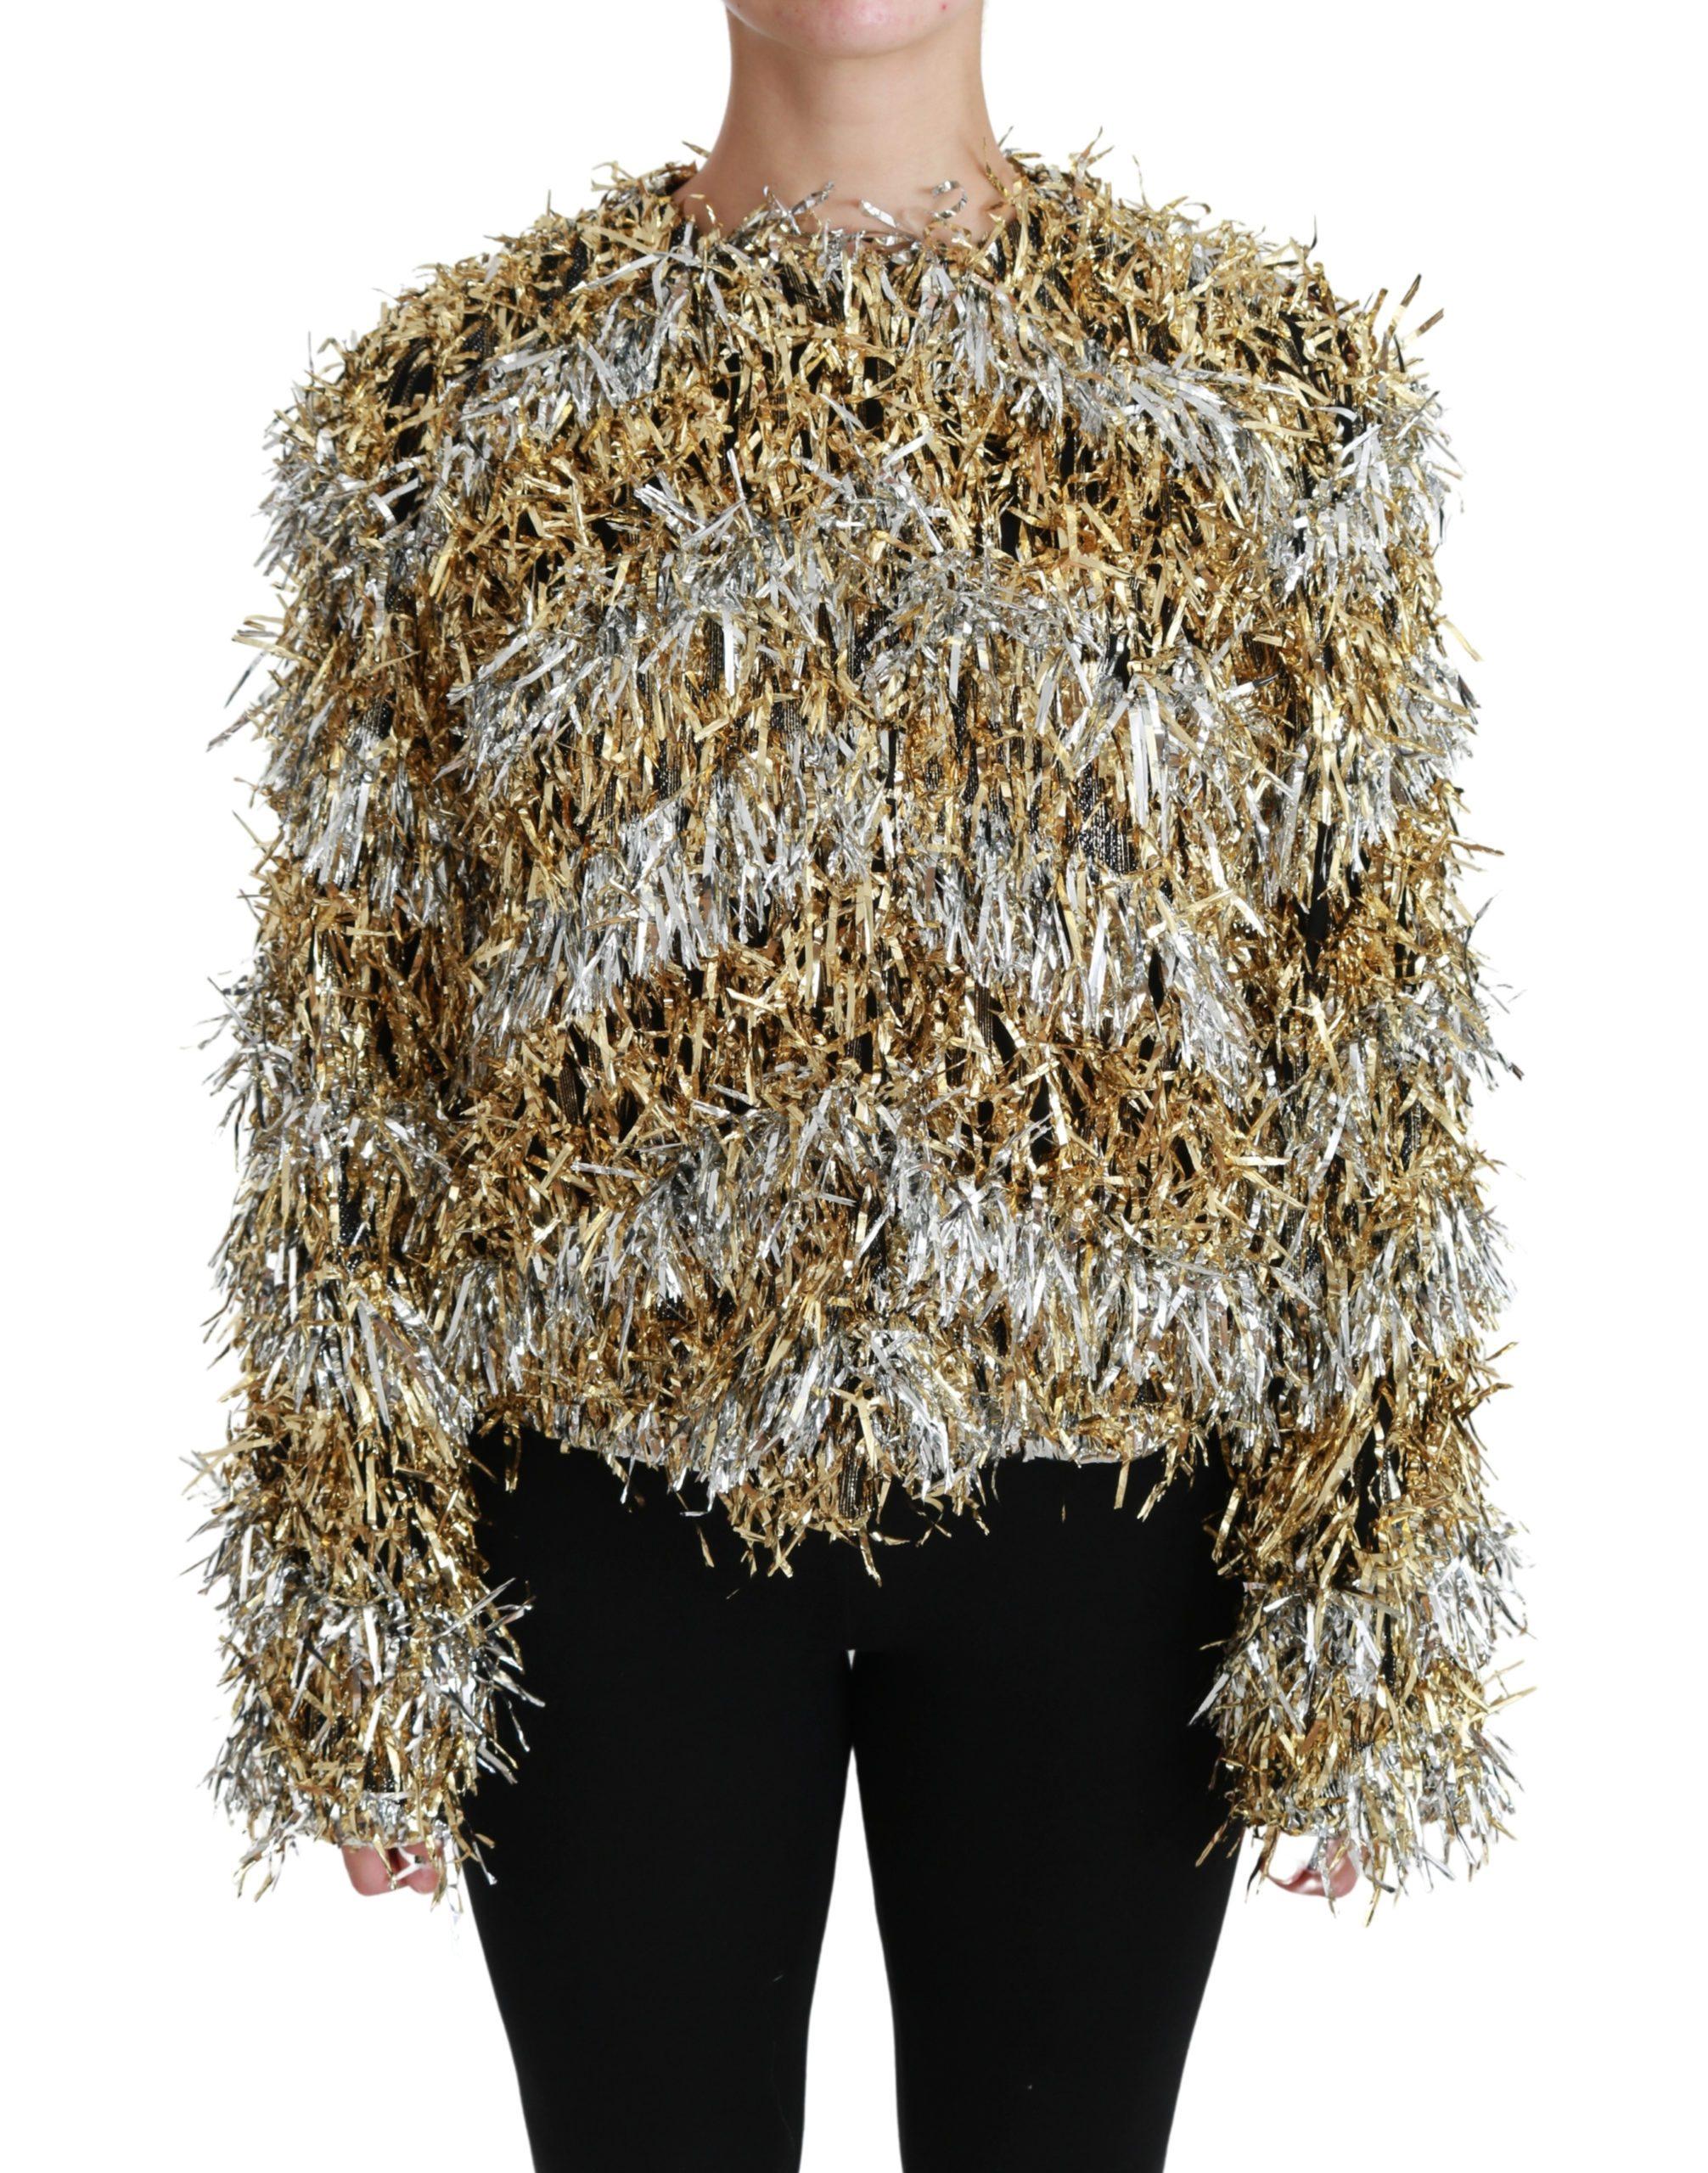 Dolce & Gabbana Women's Cardigan Jacket Gold JKT2583 - IT40|S